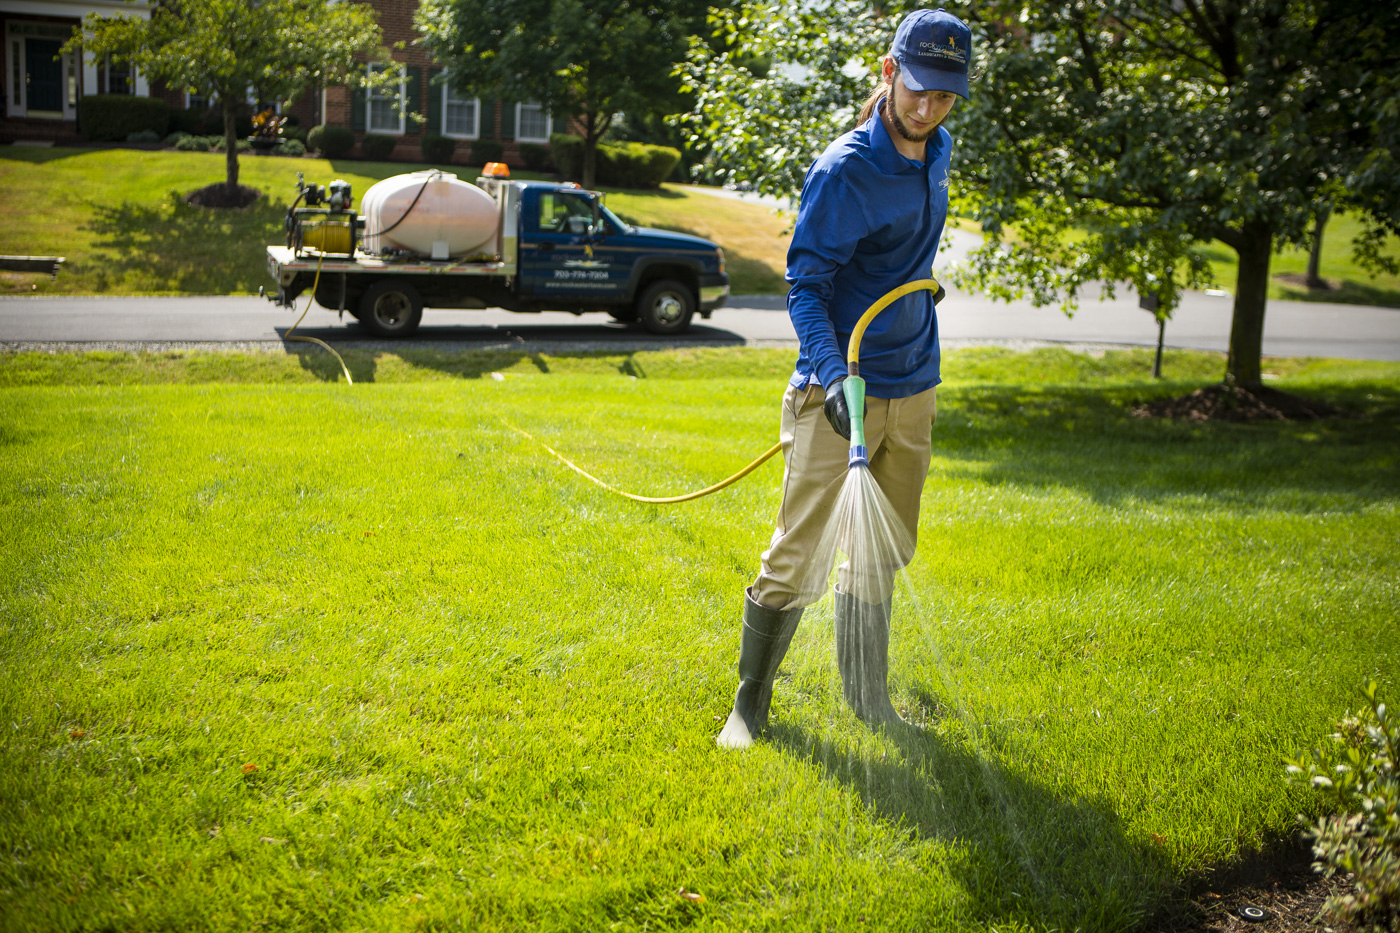 Rock Water Farm lawn technician spraying lawn